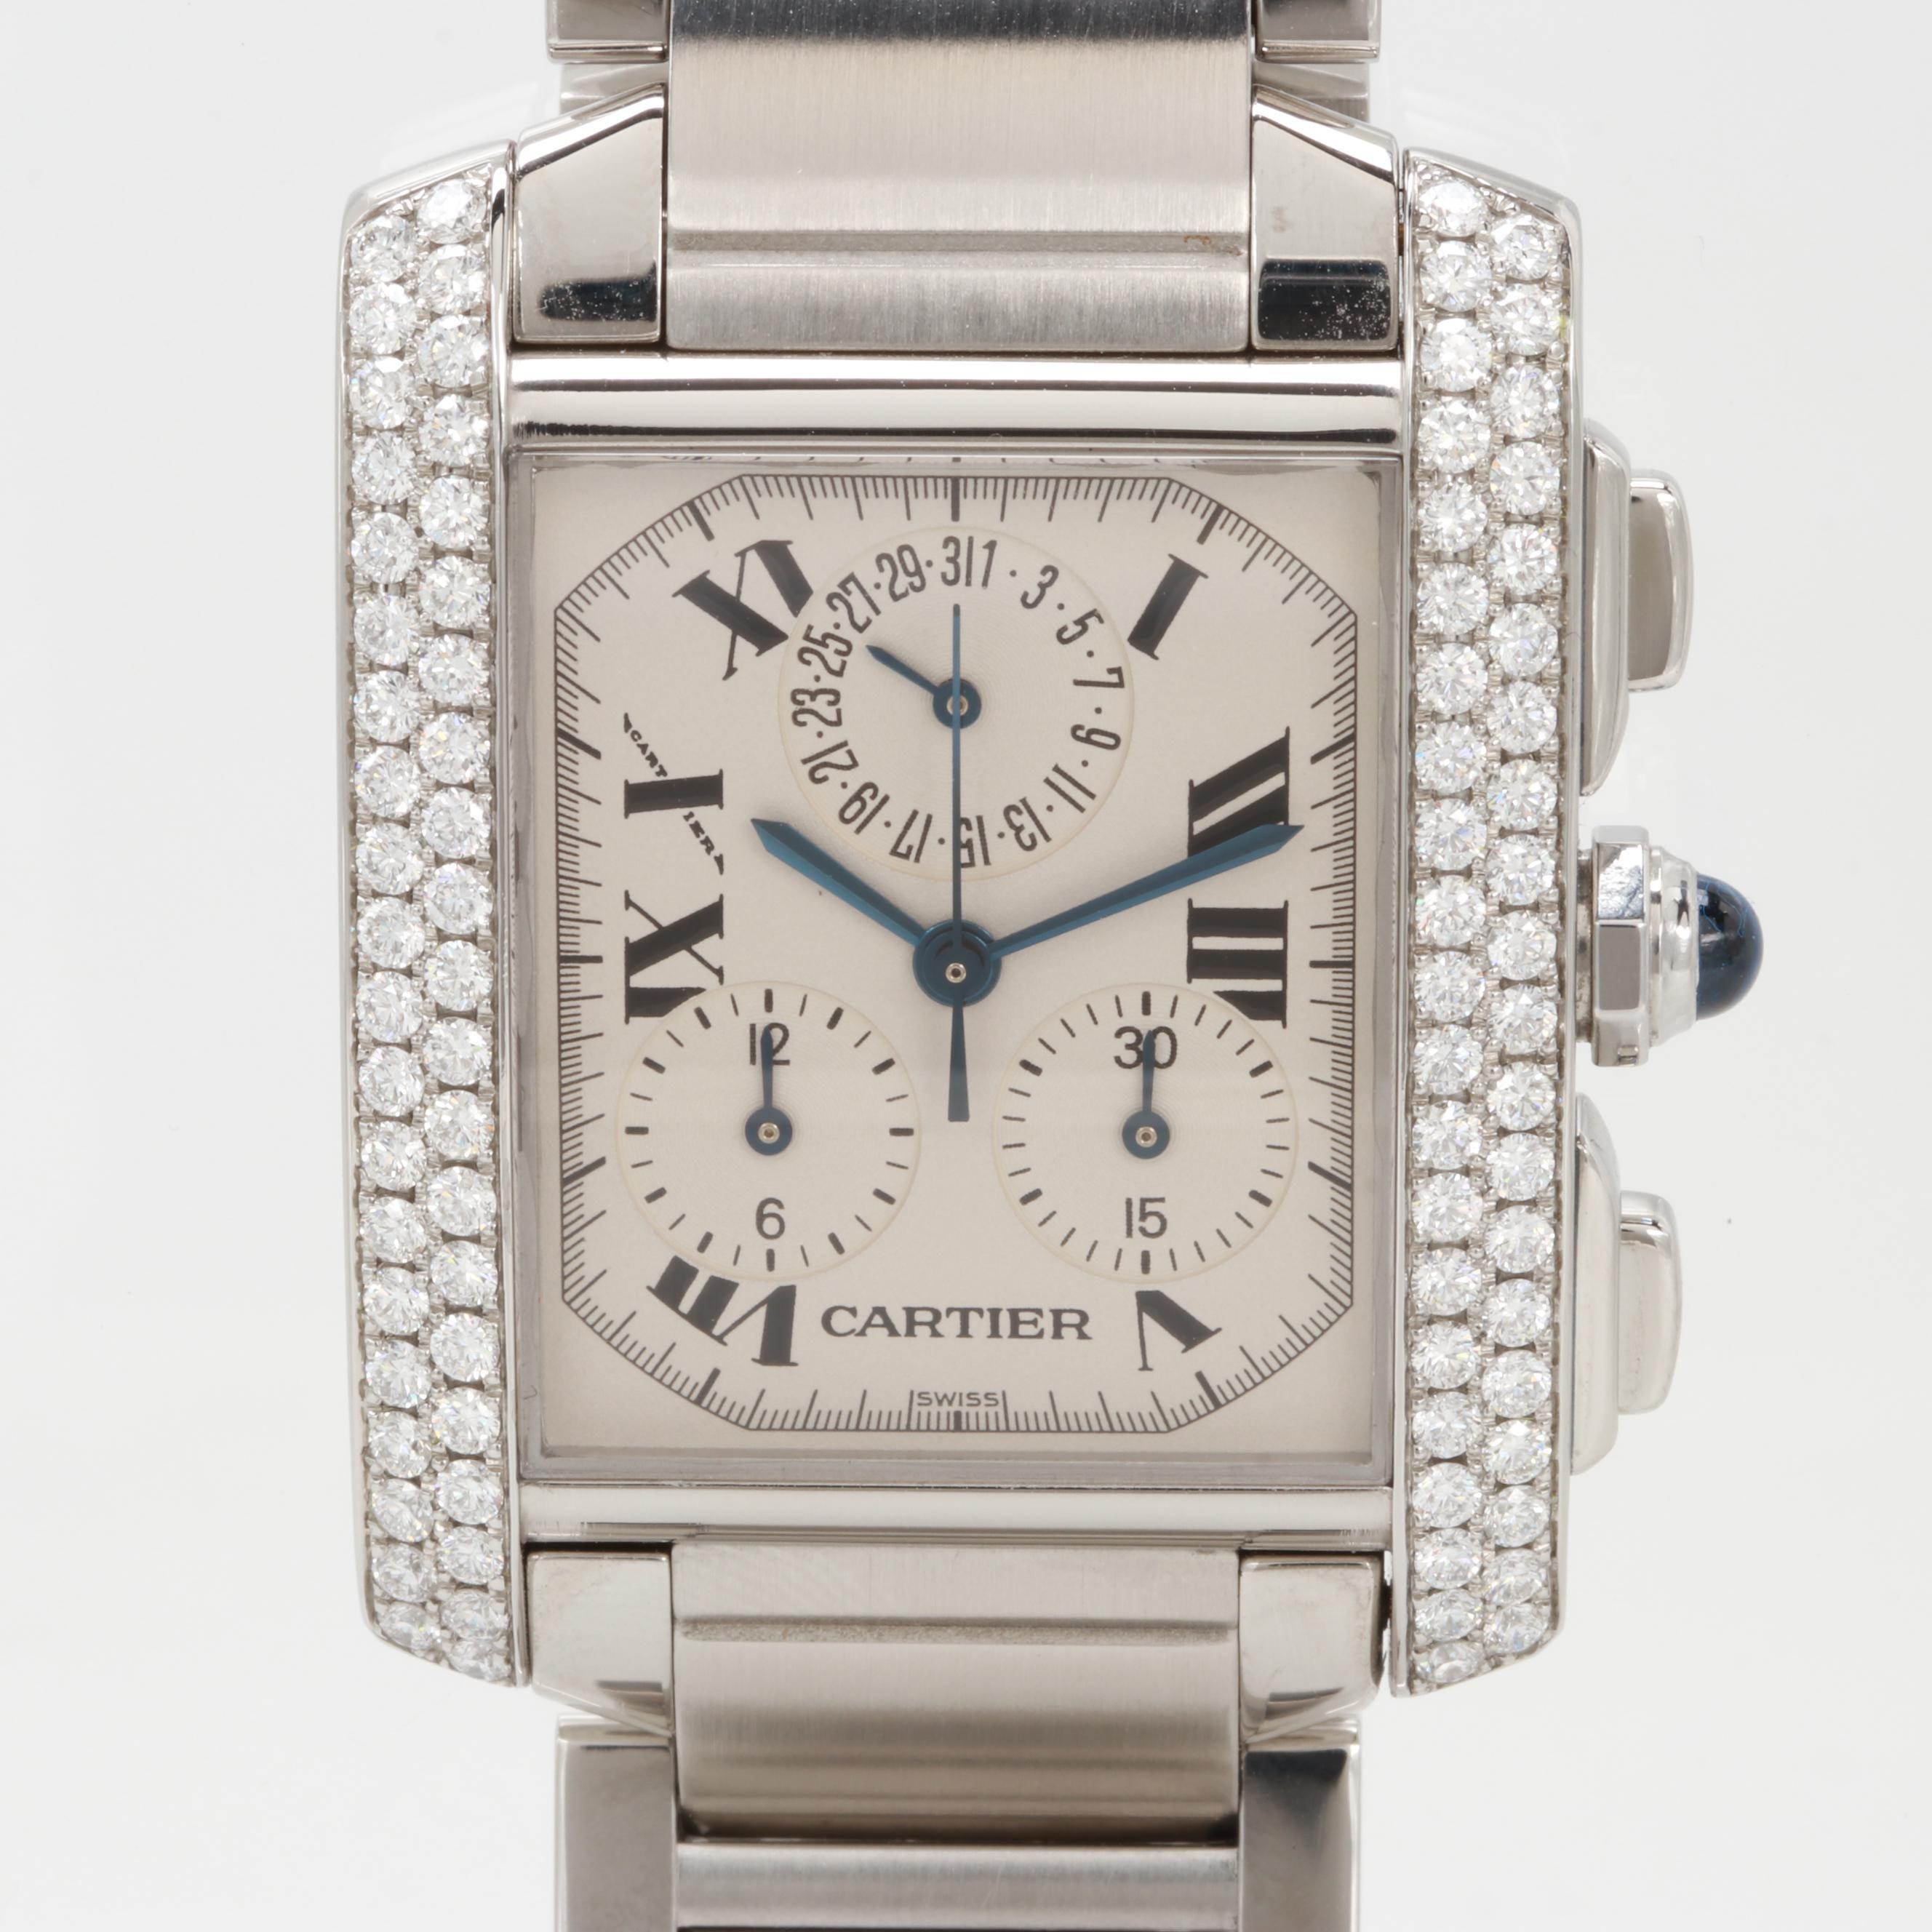 Cartier Tank Française Chronograph Wristwatch With 1.64 CTW Diamond Bezel